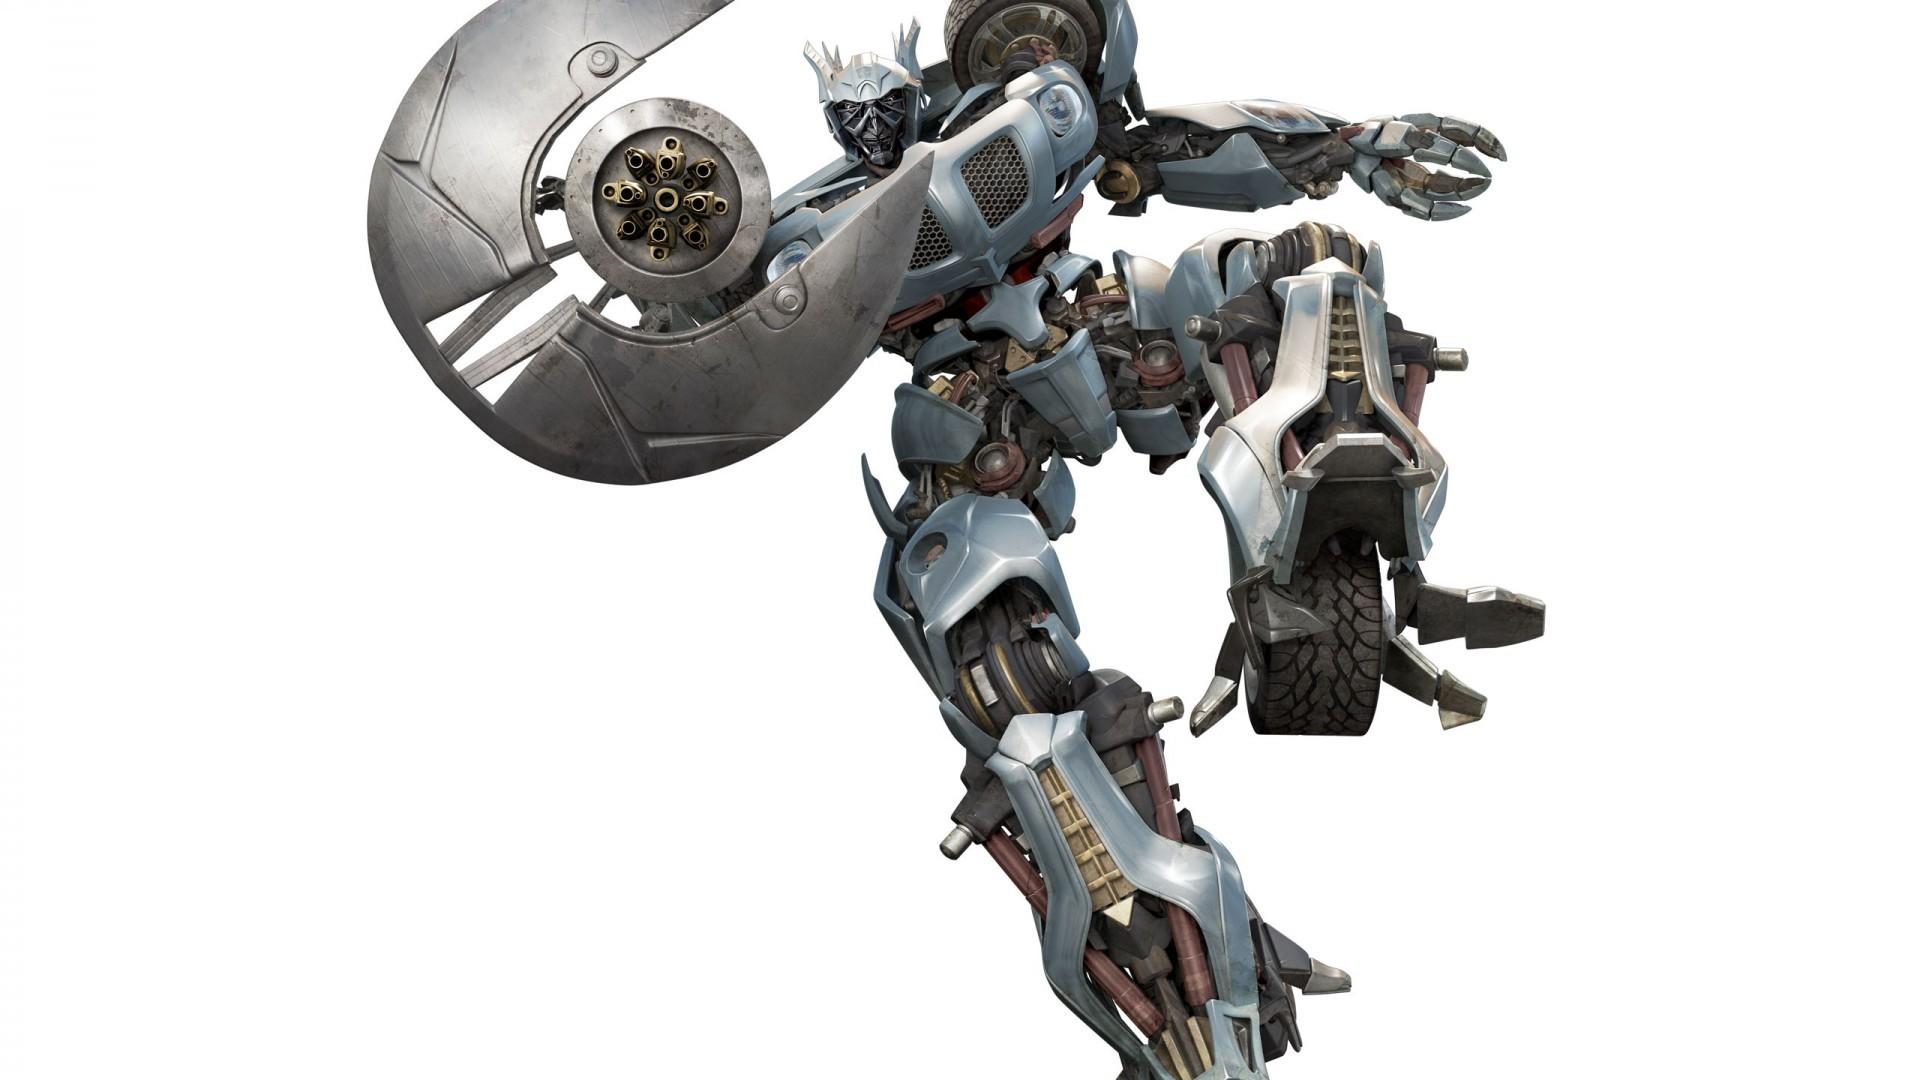 Transformers Artwork Wallpaper 1920x1080 11114